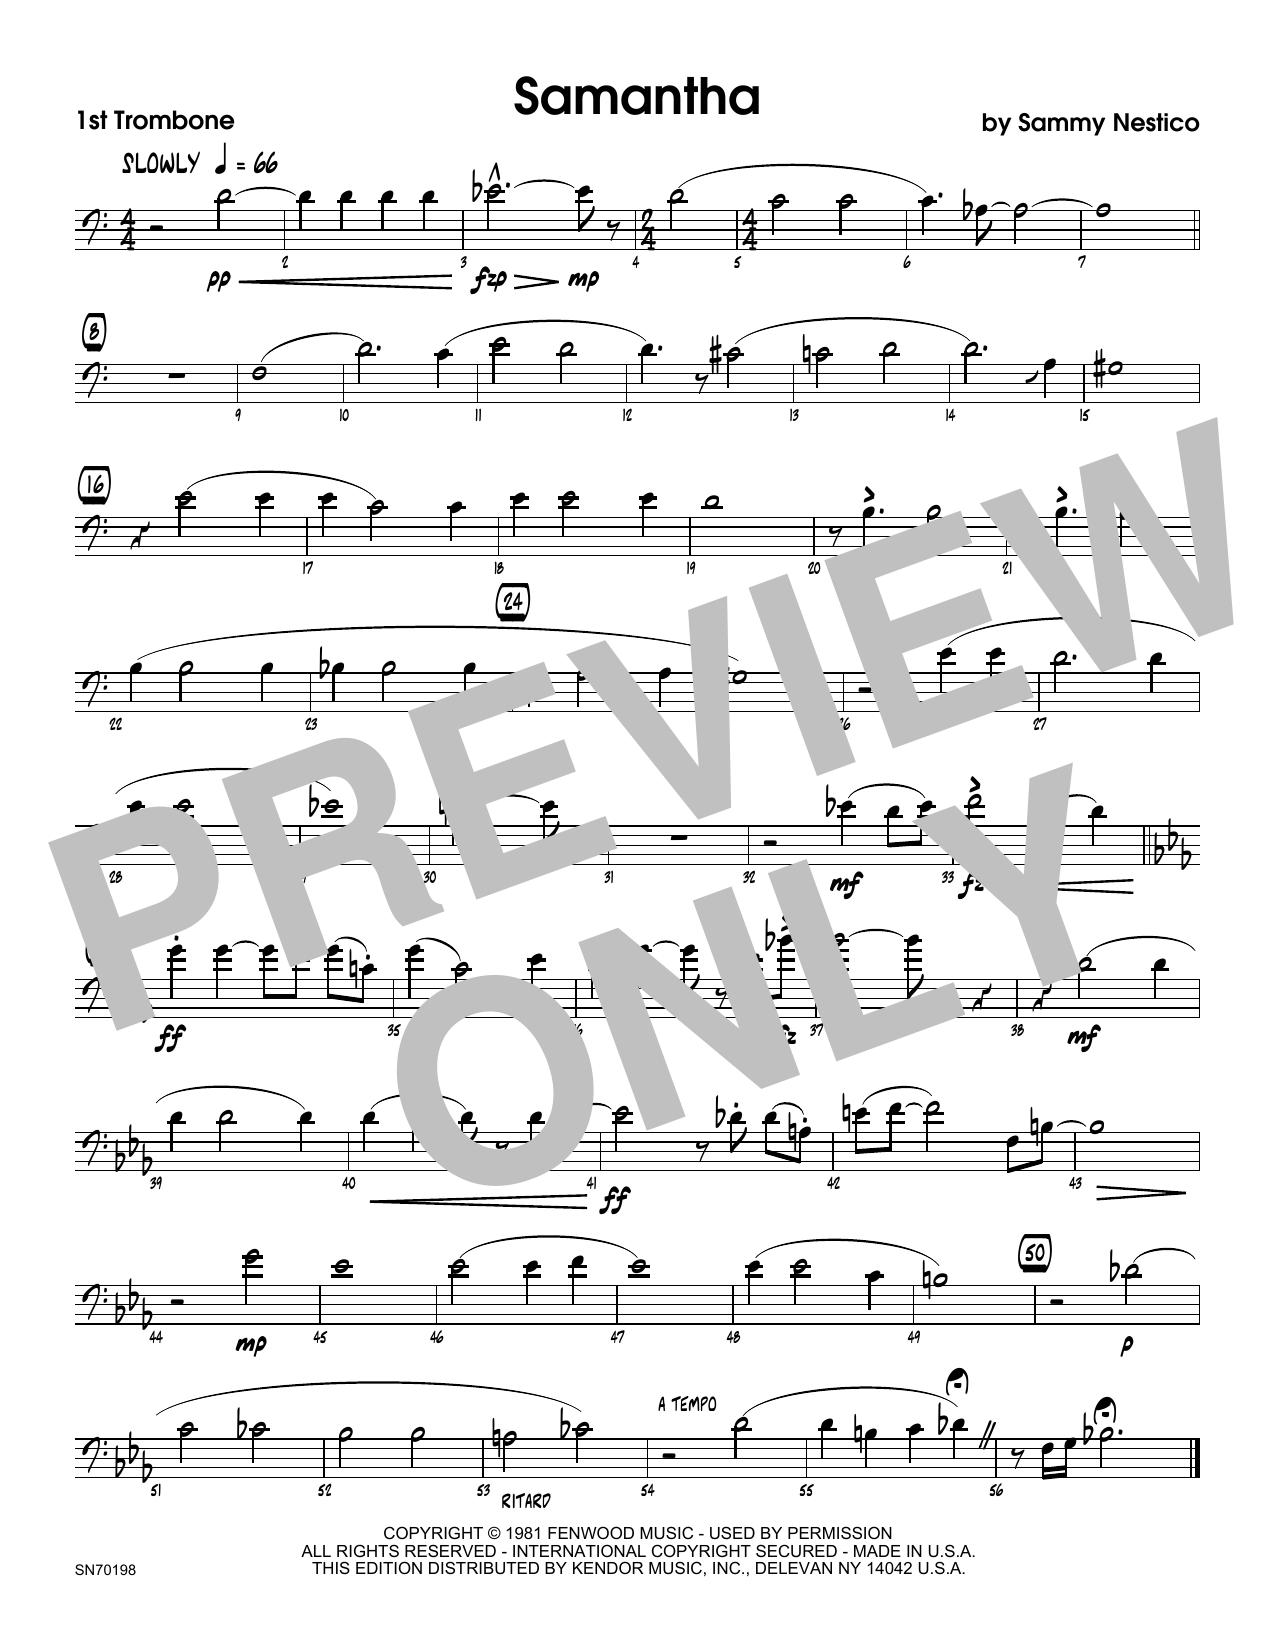 Samantha - 1st Trombone